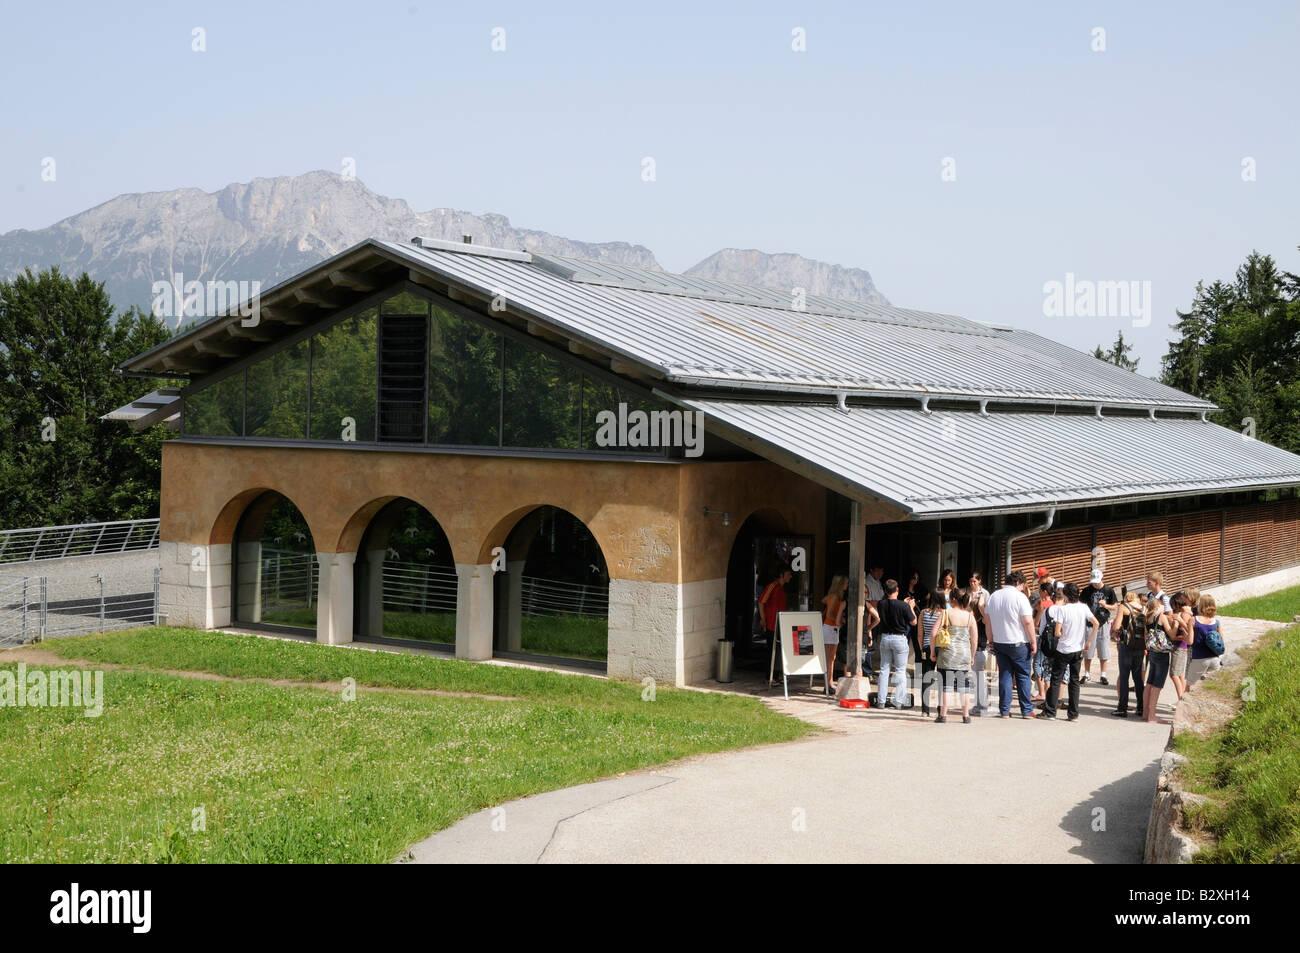 Museum erected on site of Hitlers Berghof mountain retreat, Obersalzberg, Bavaria, Germany - Stock Image